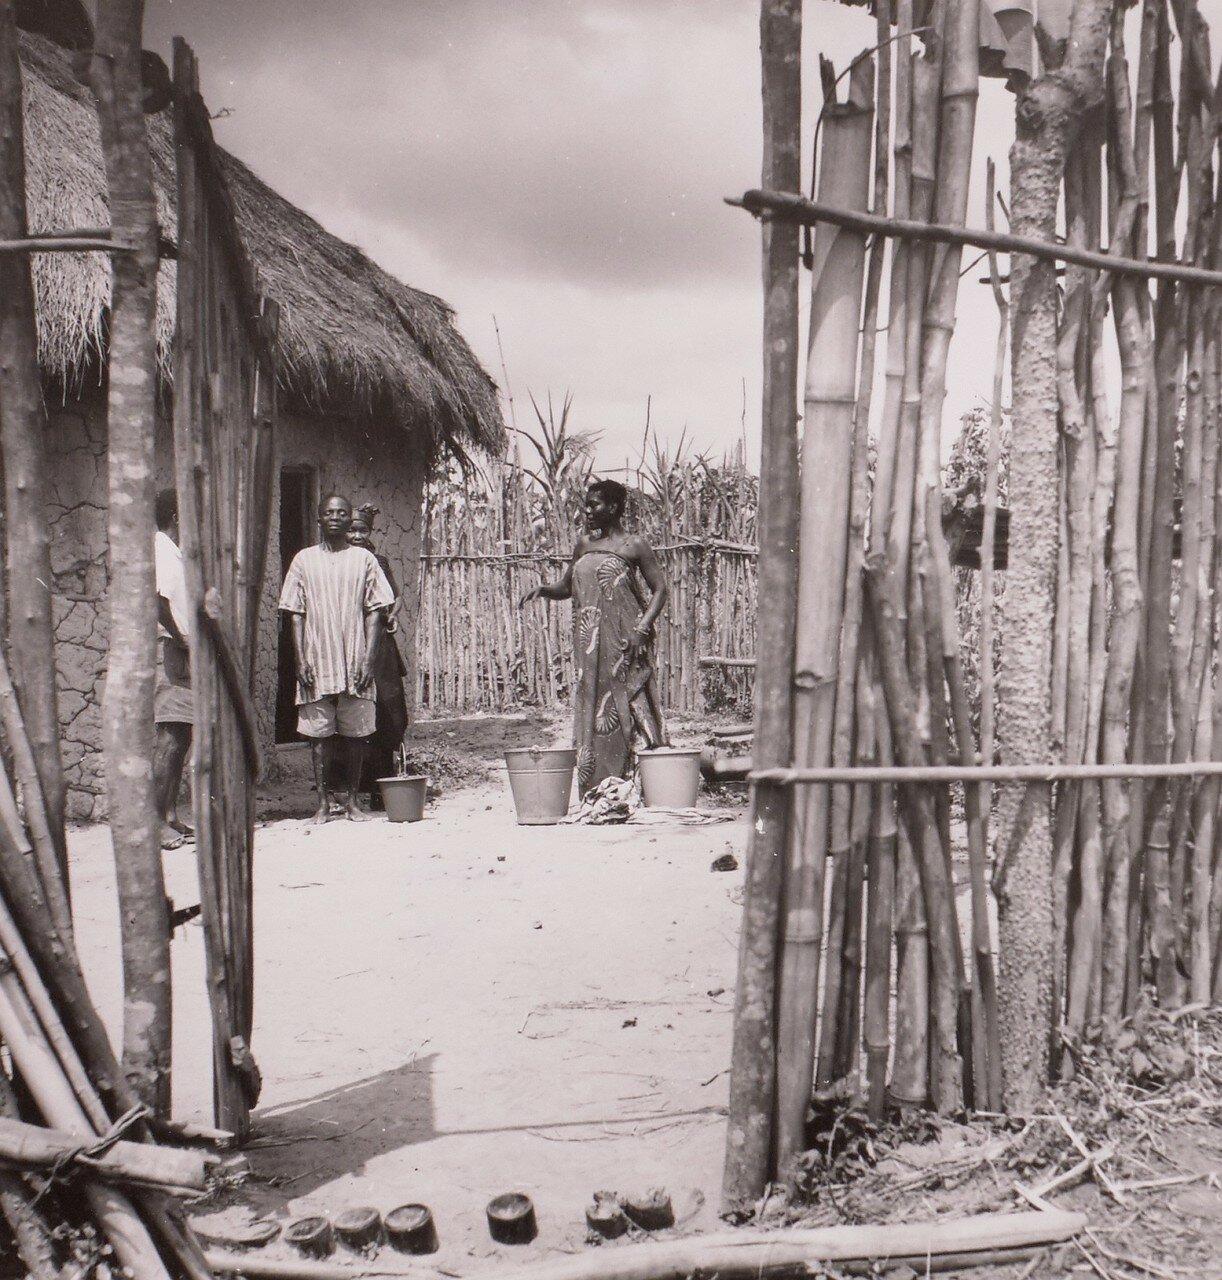 Гана. Деревня в саванне